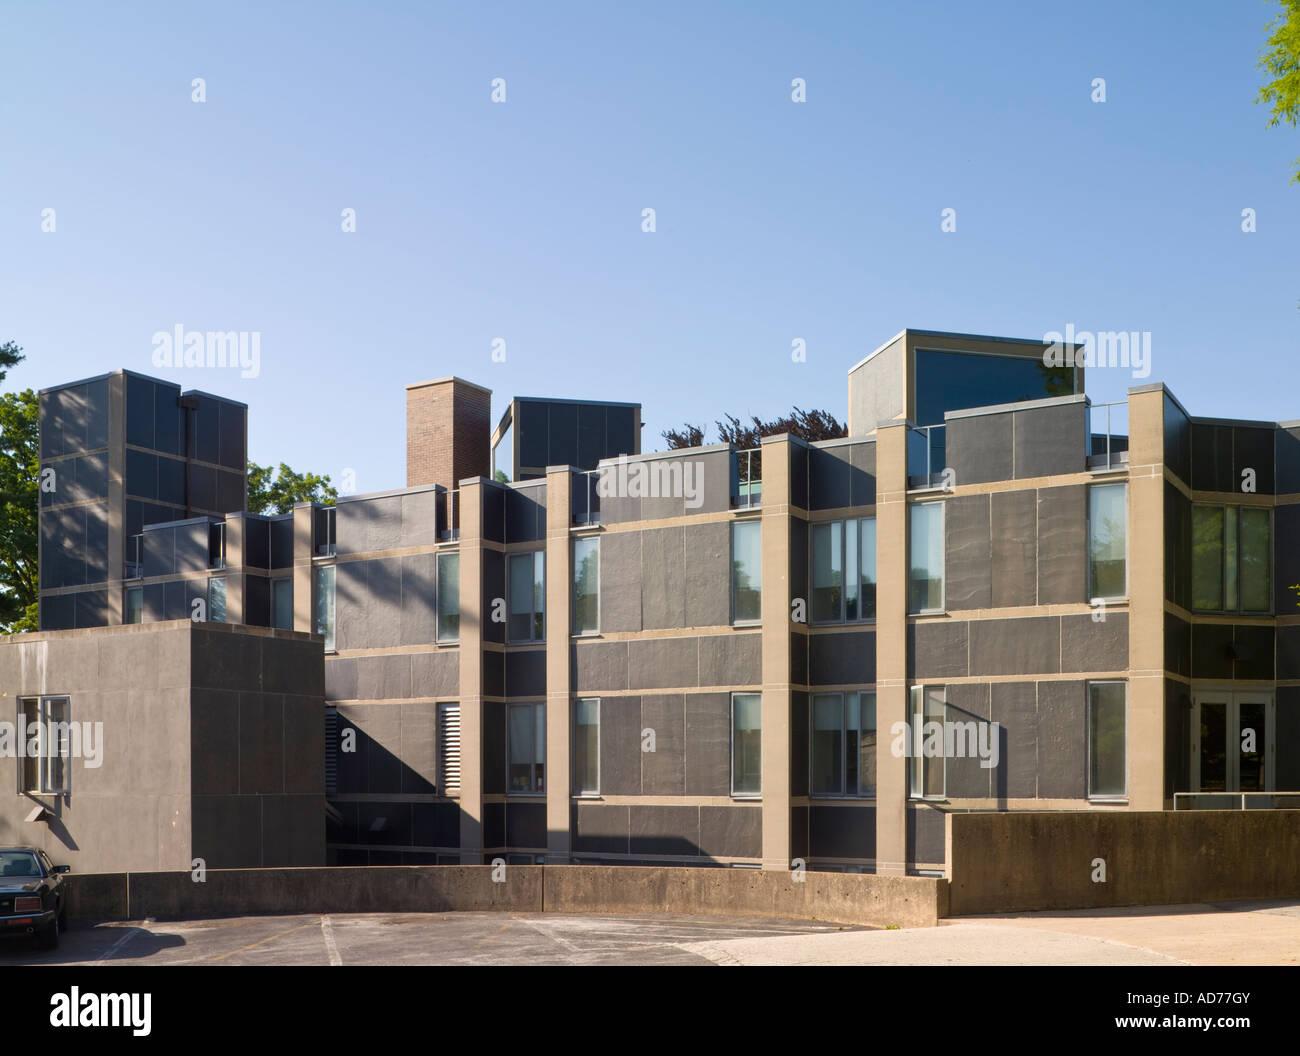 Erdman Hall Dormitories, Bryn Mawr College, Pennsylvania, USA